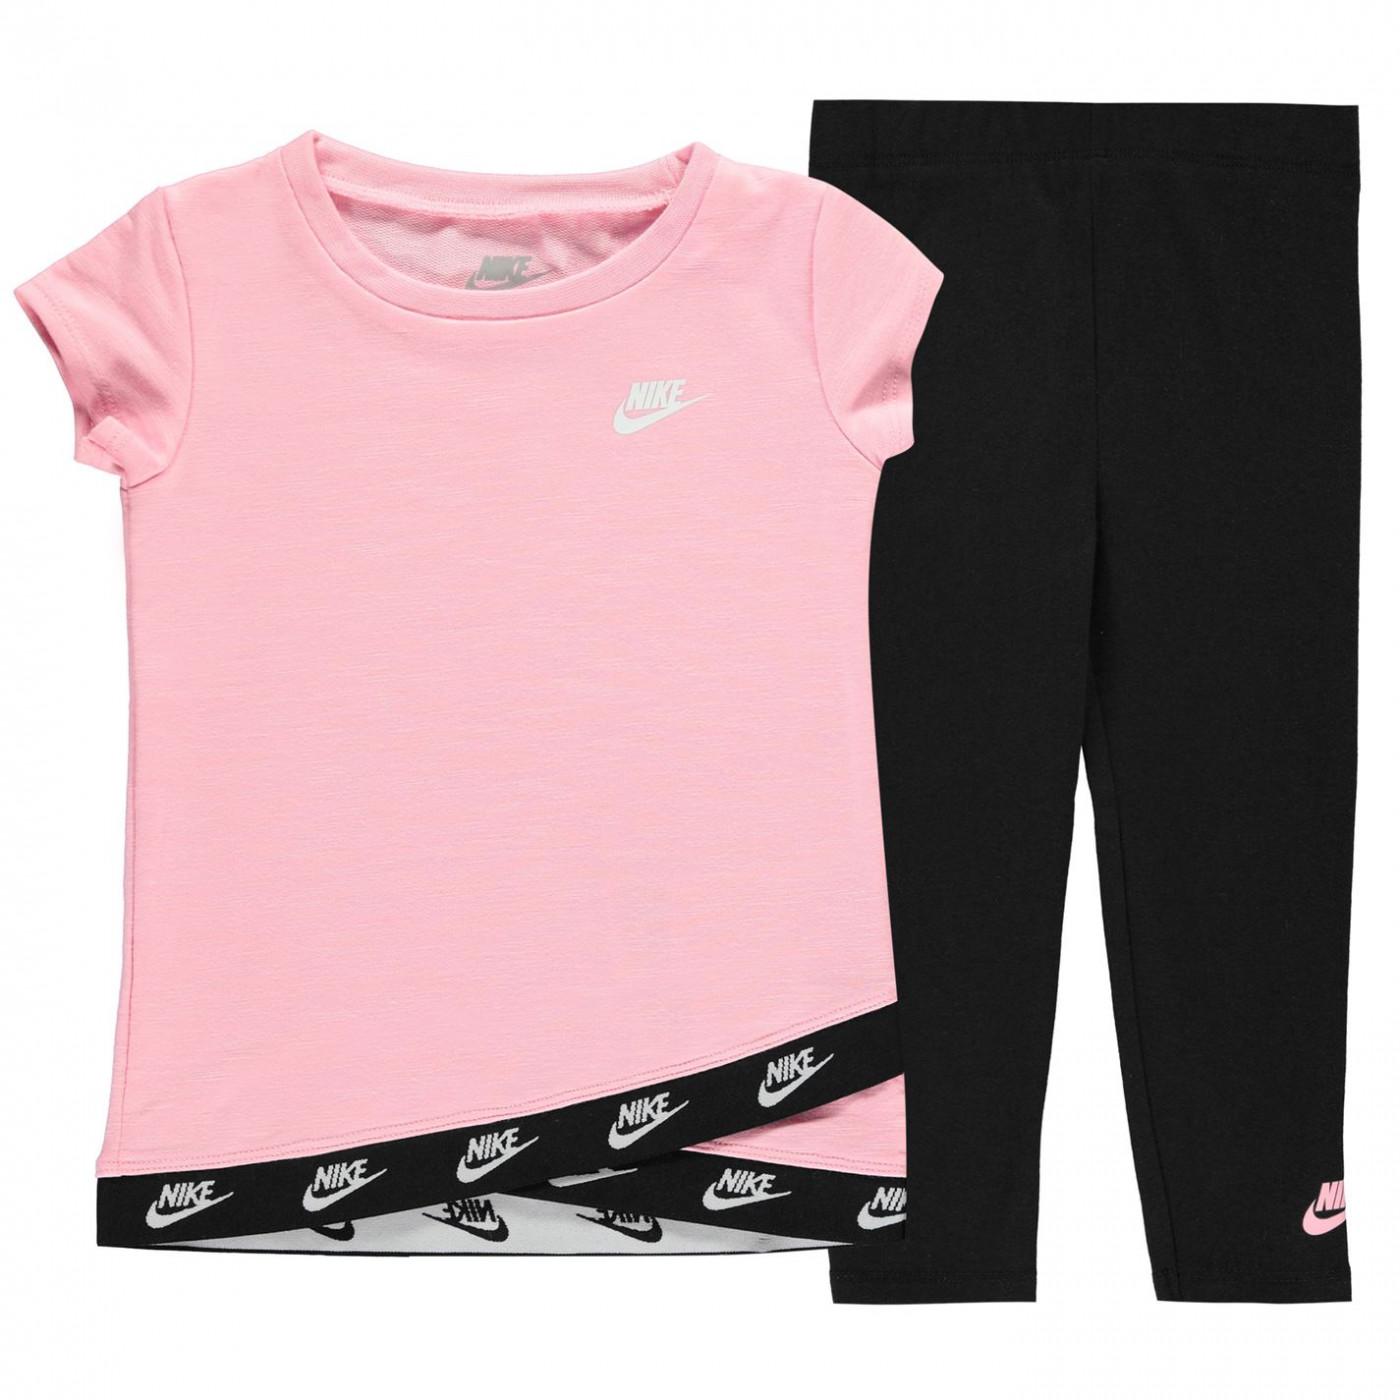 Nike Leggings and Top Set Baby Girls